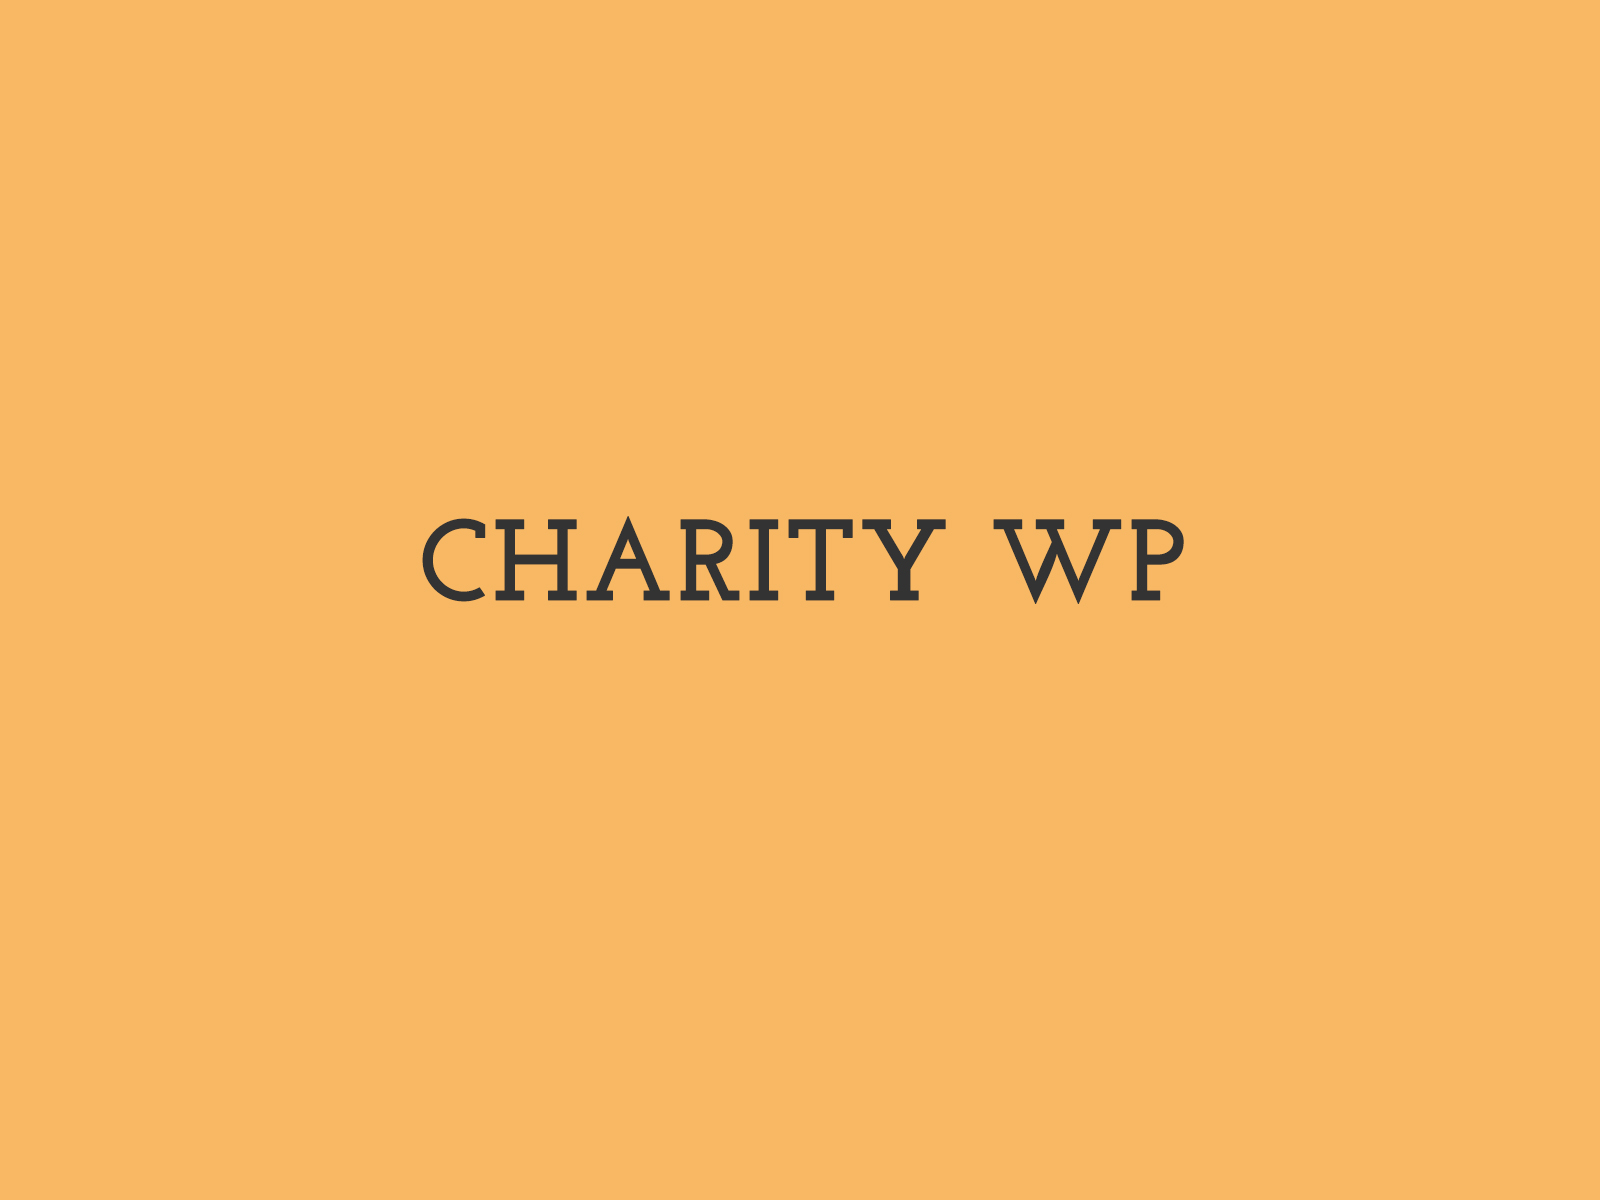 wp charity themes